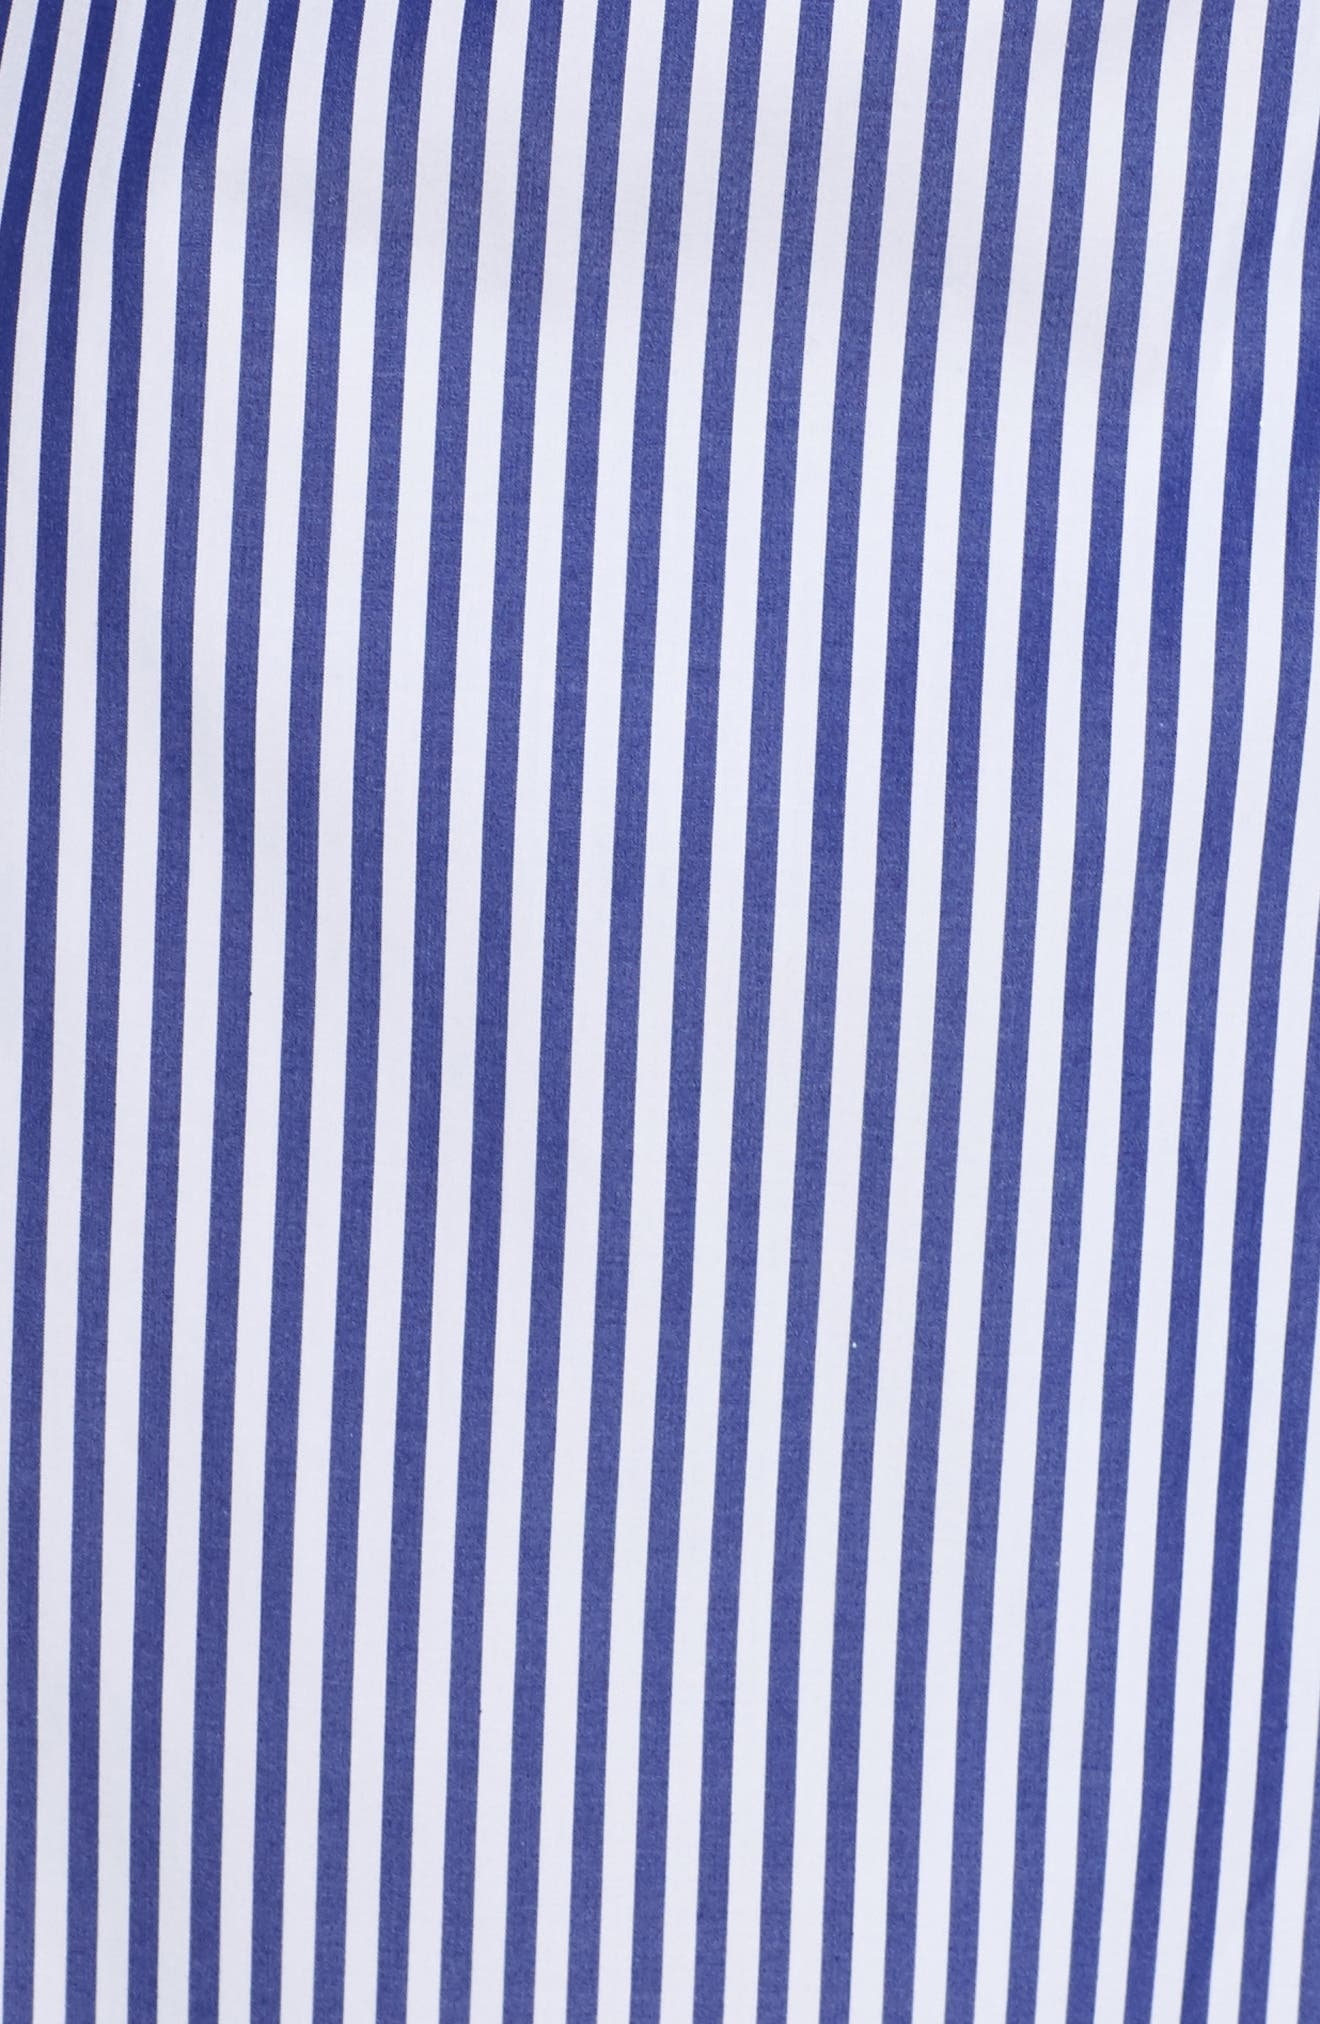 Stripe Robe,                             Alternate thumbnail 5, color,                             400